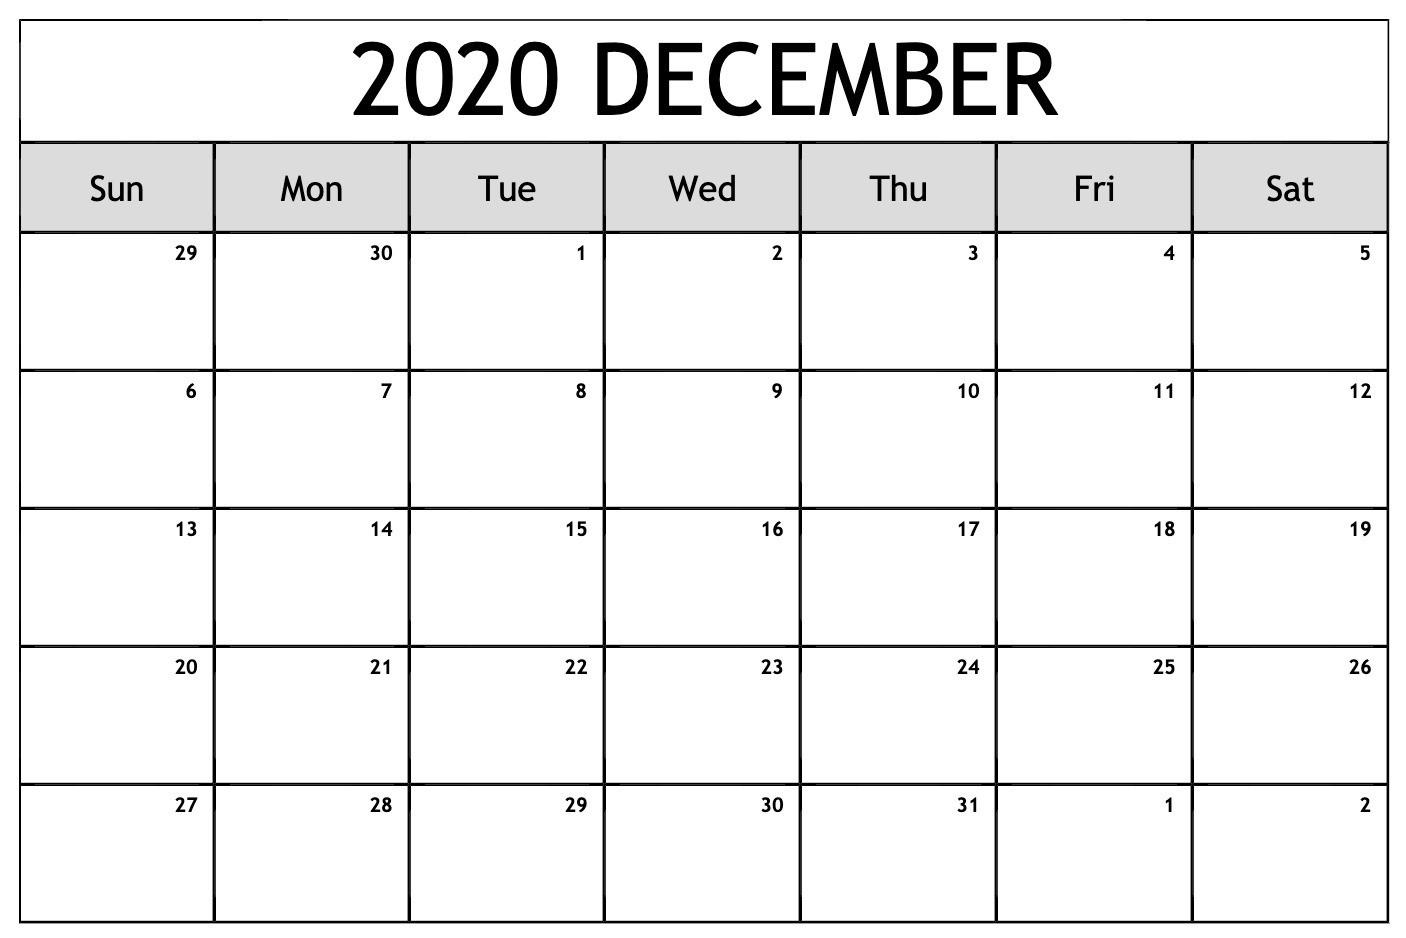 December 2020 Calendar Pdf, Word, Excel Printable Template-January 2020 Calendar In Excel